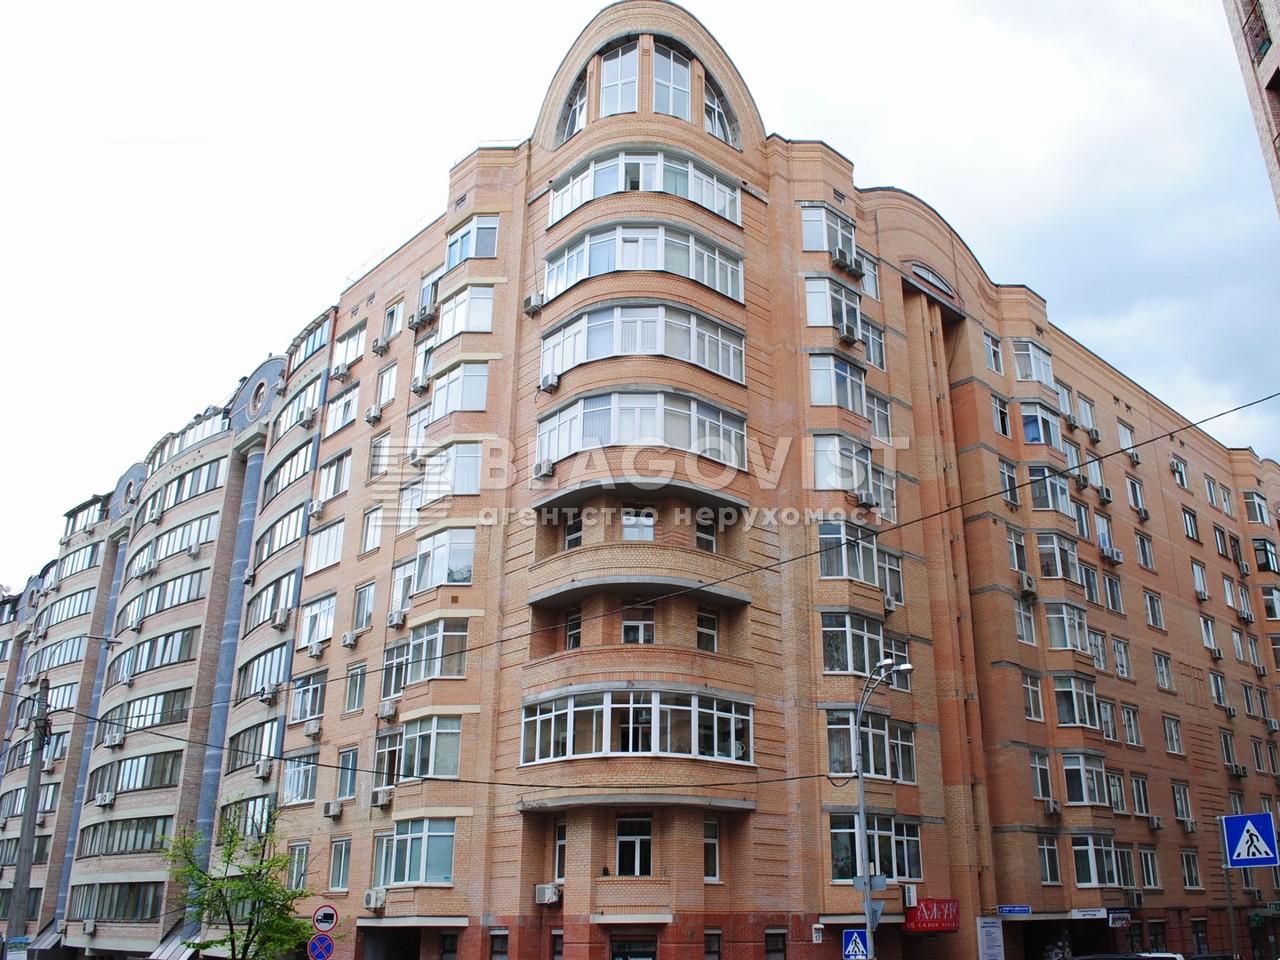 Квартира R-16873, Павловская, 17, Киев - Фото 1